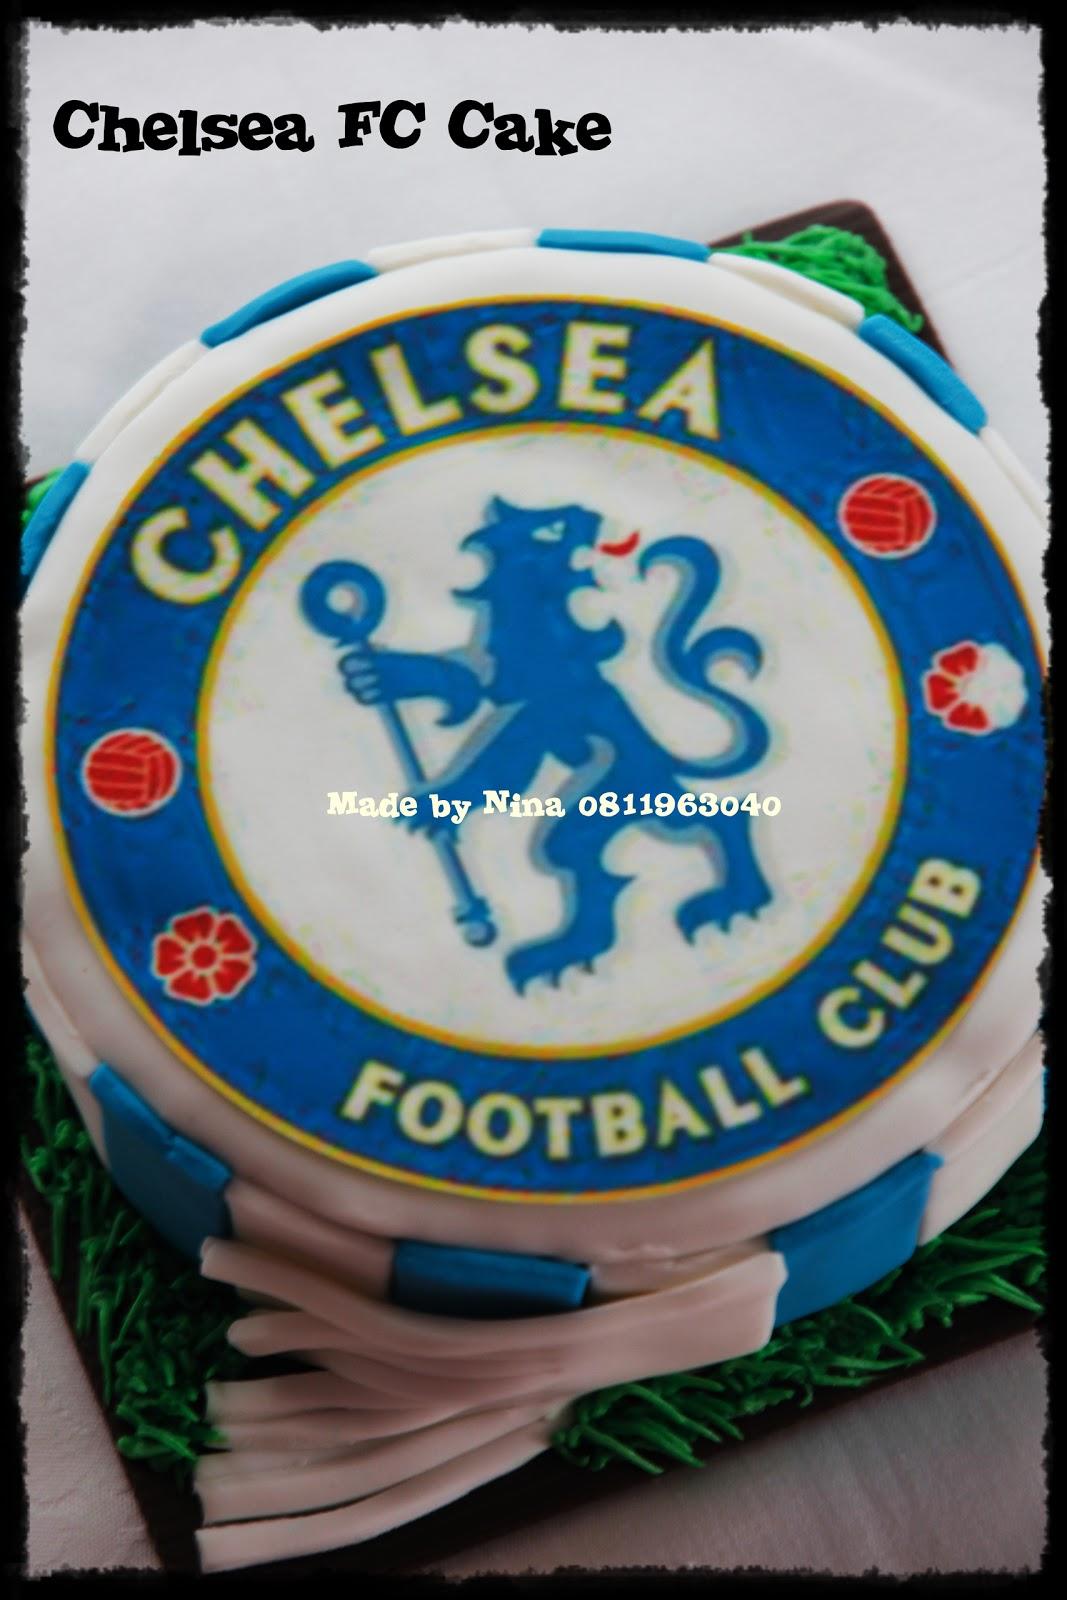 Chelsea Fc Football Club Badges 2014 Logo Chelsea FC